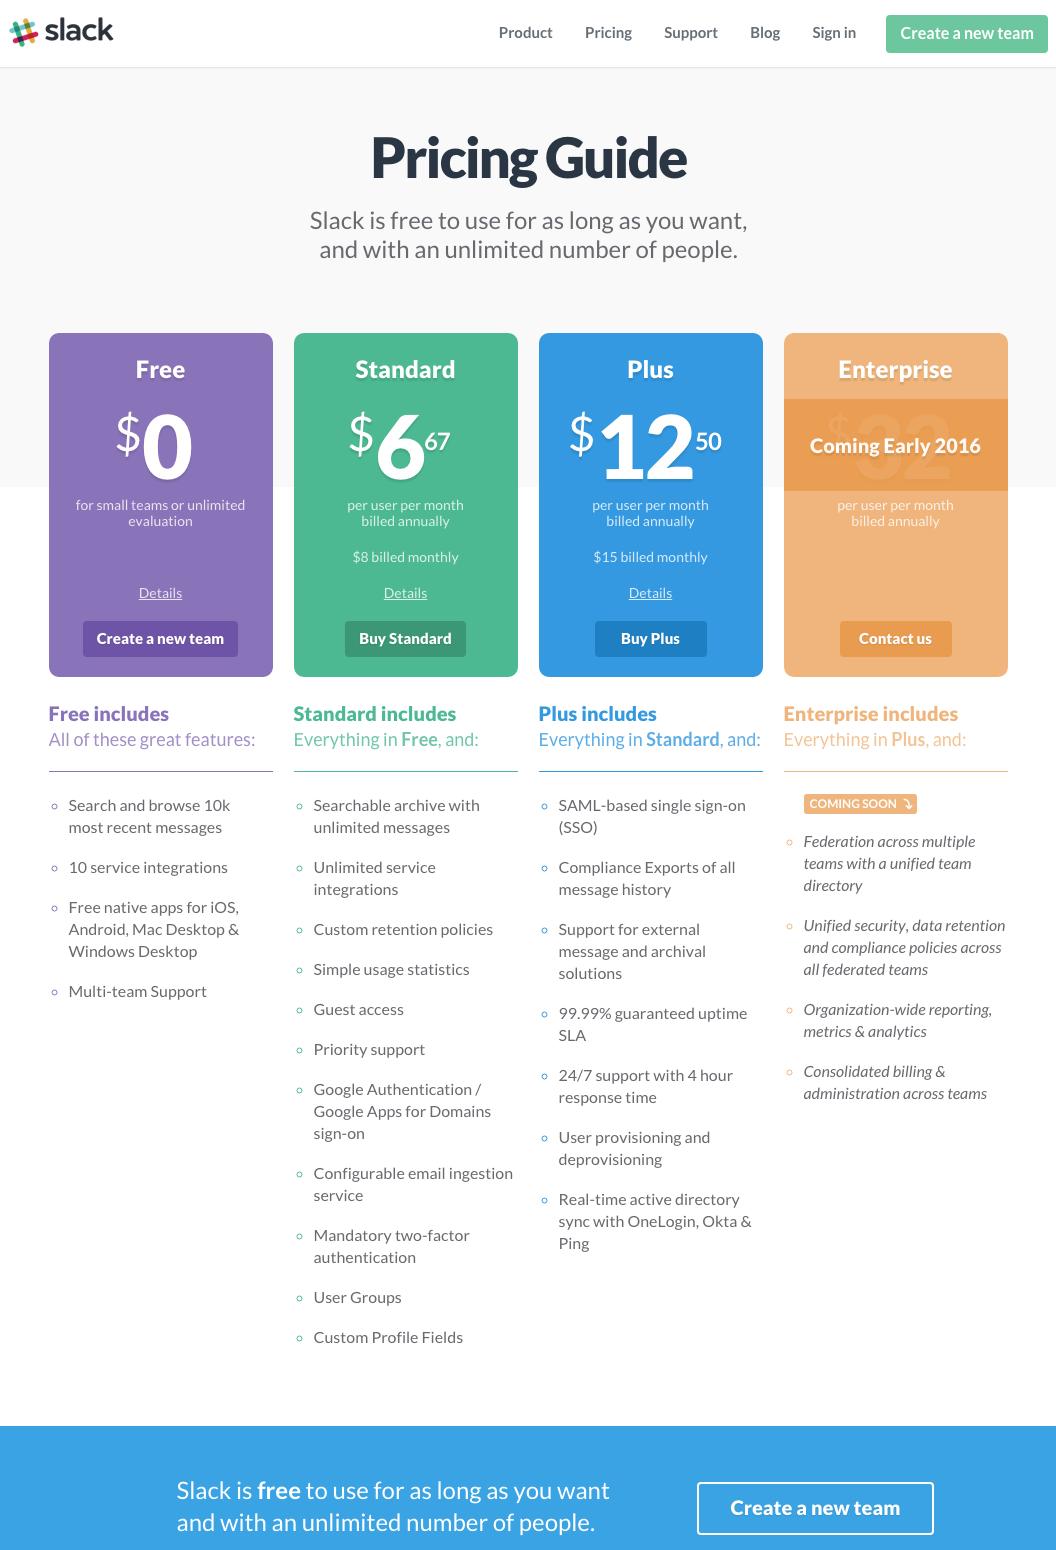 slack-pricing-page.png